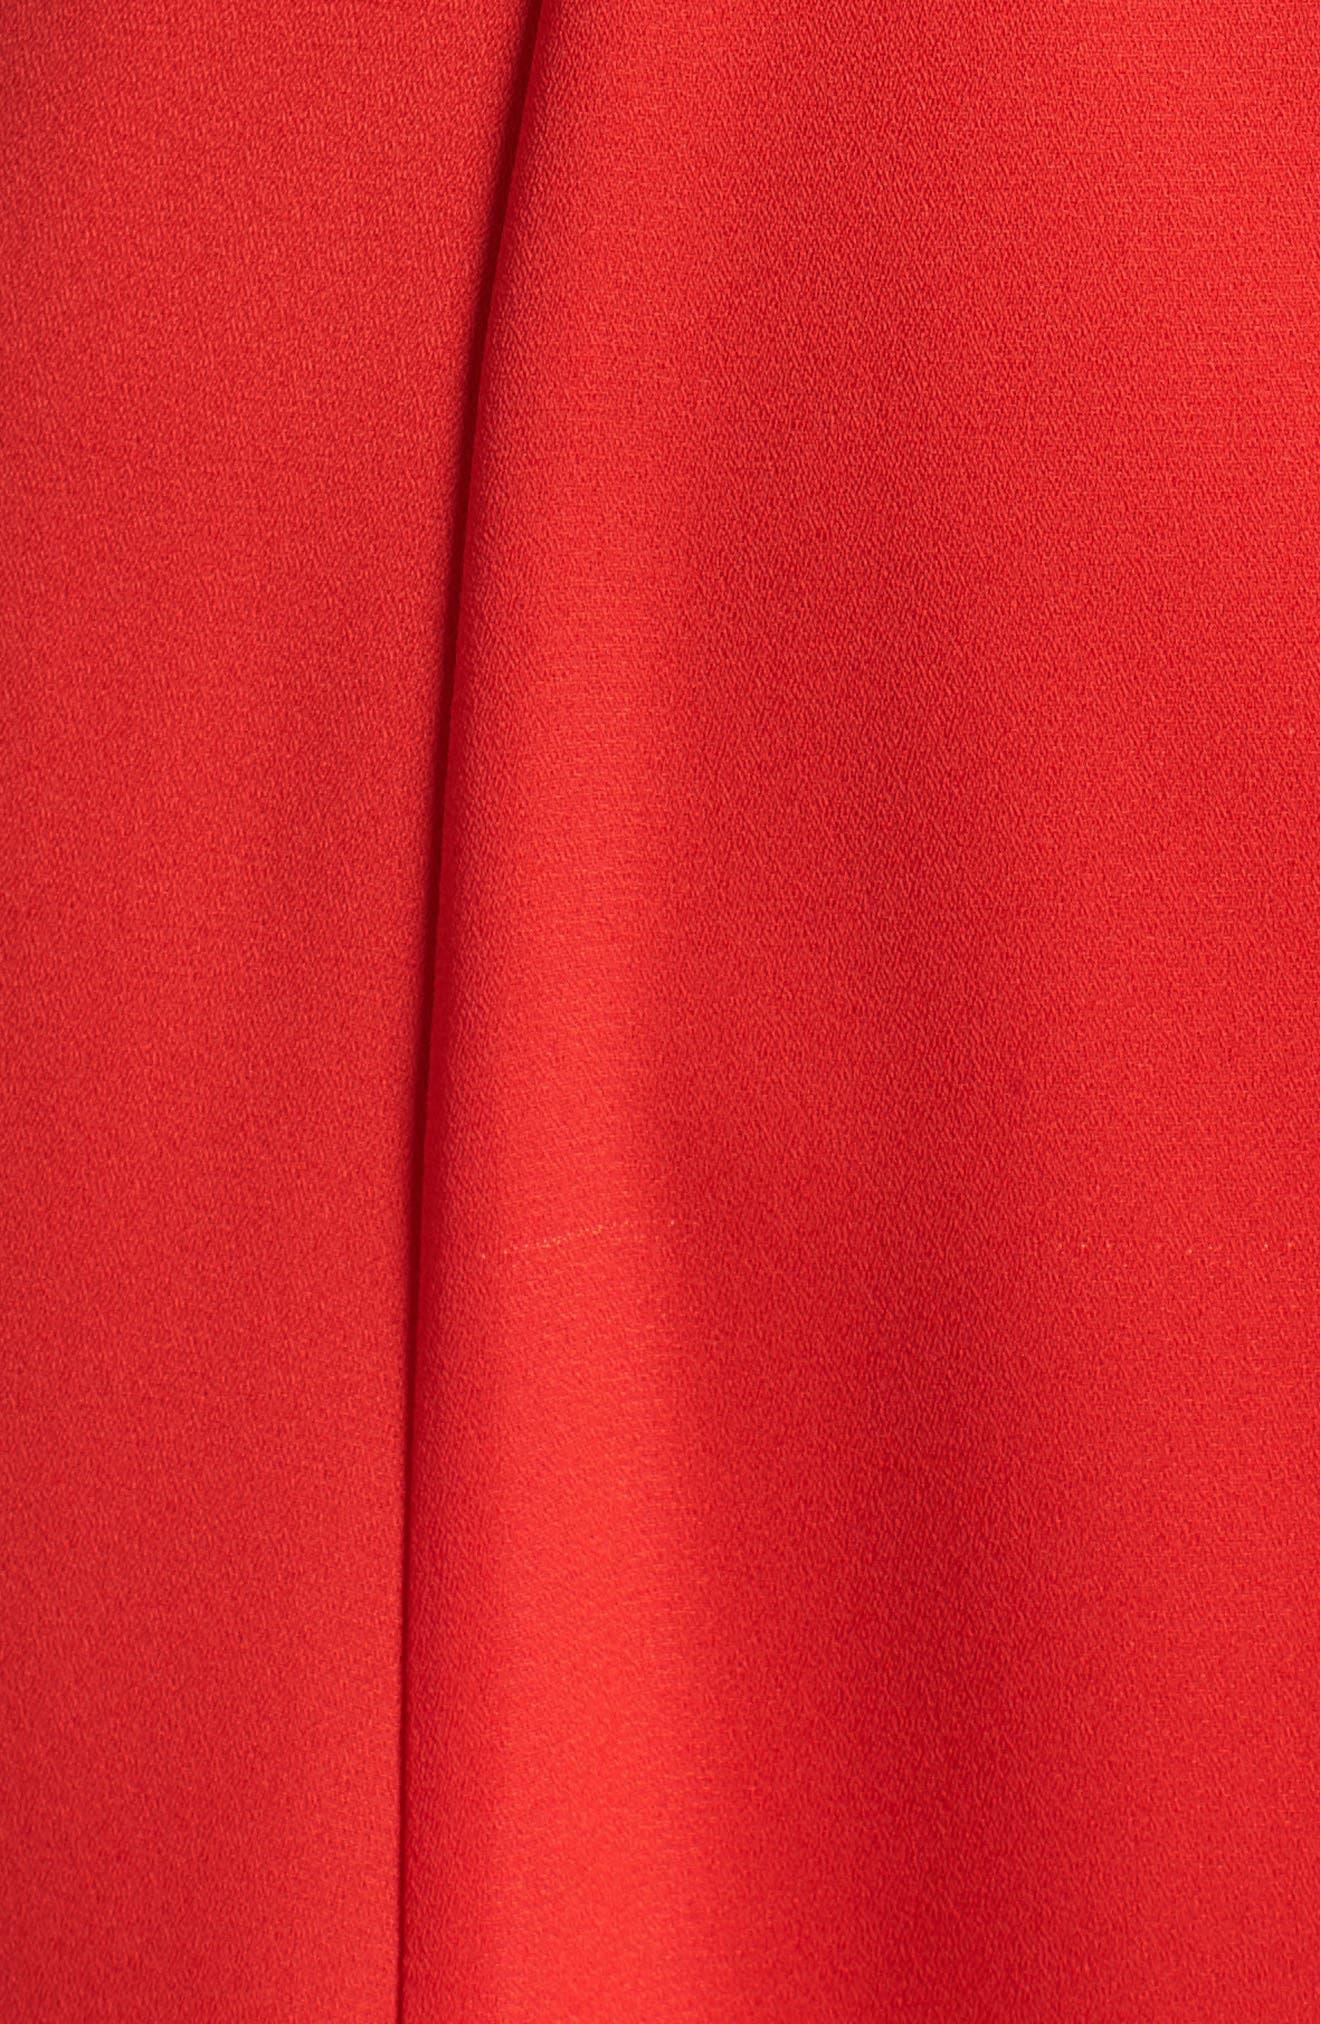 Ruffle Sleeve Dress,                             Alternate thumbnail 11, color,